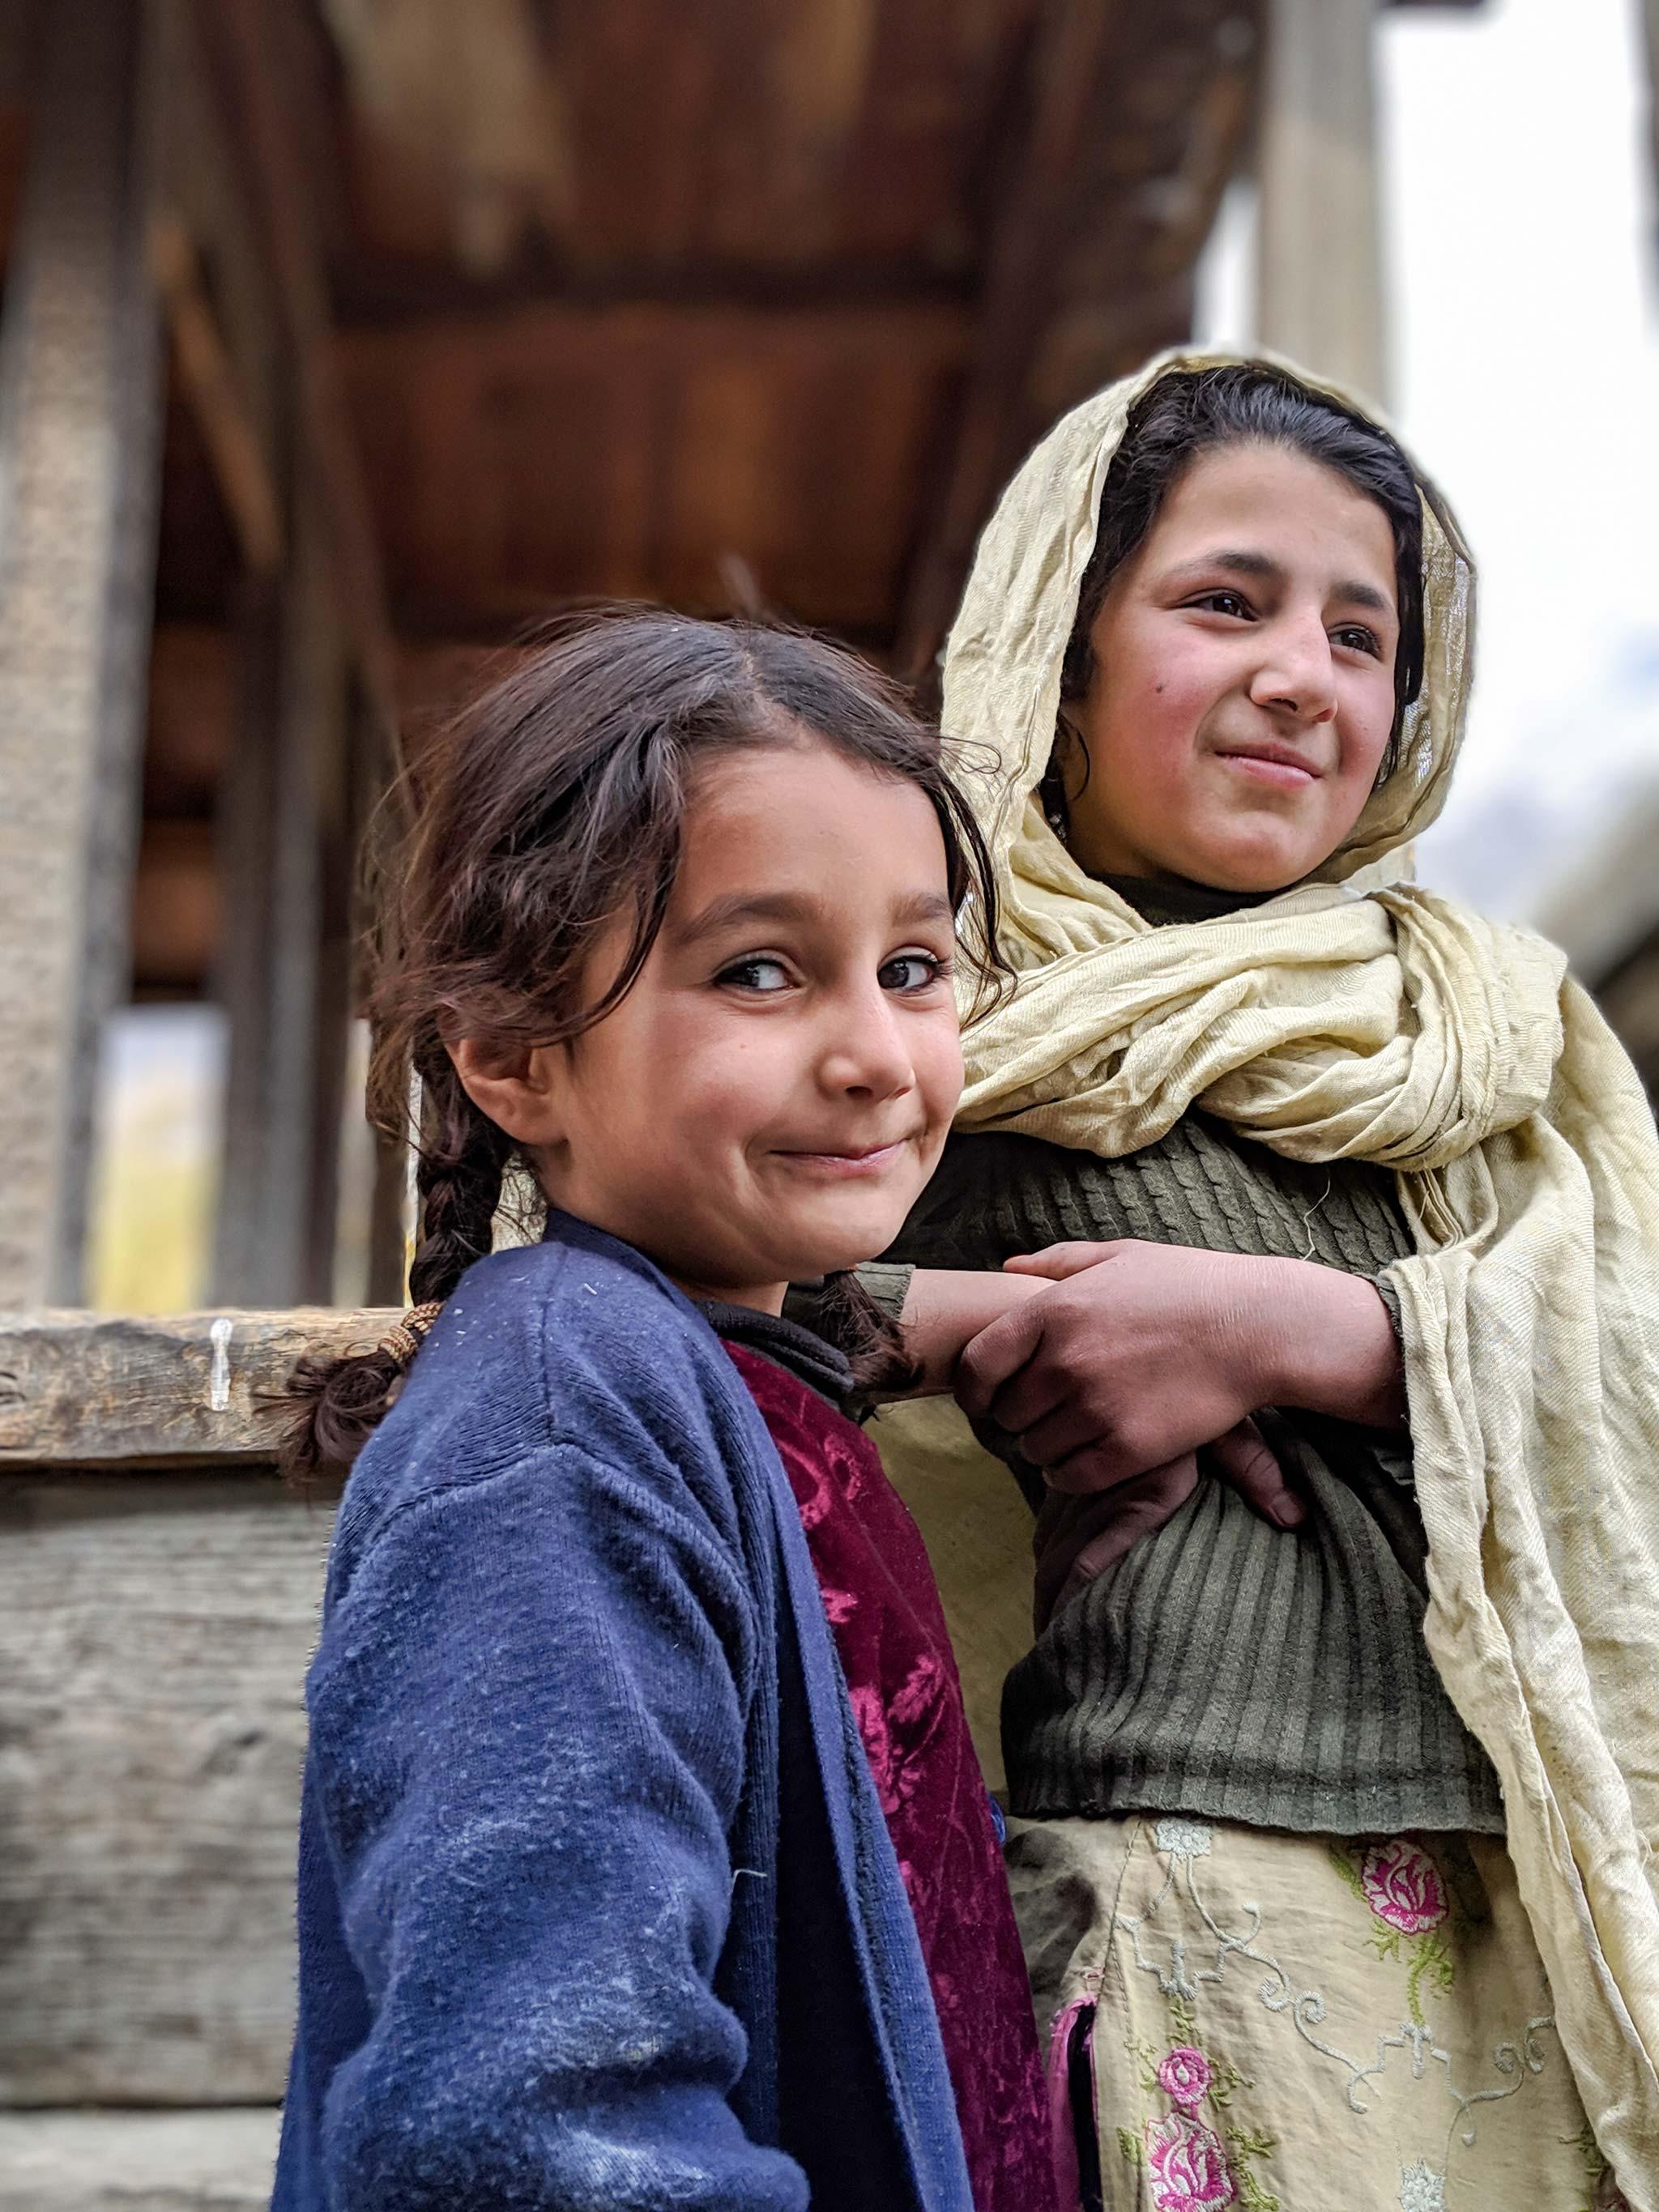 Pakistan's-Eyes-23.jpg